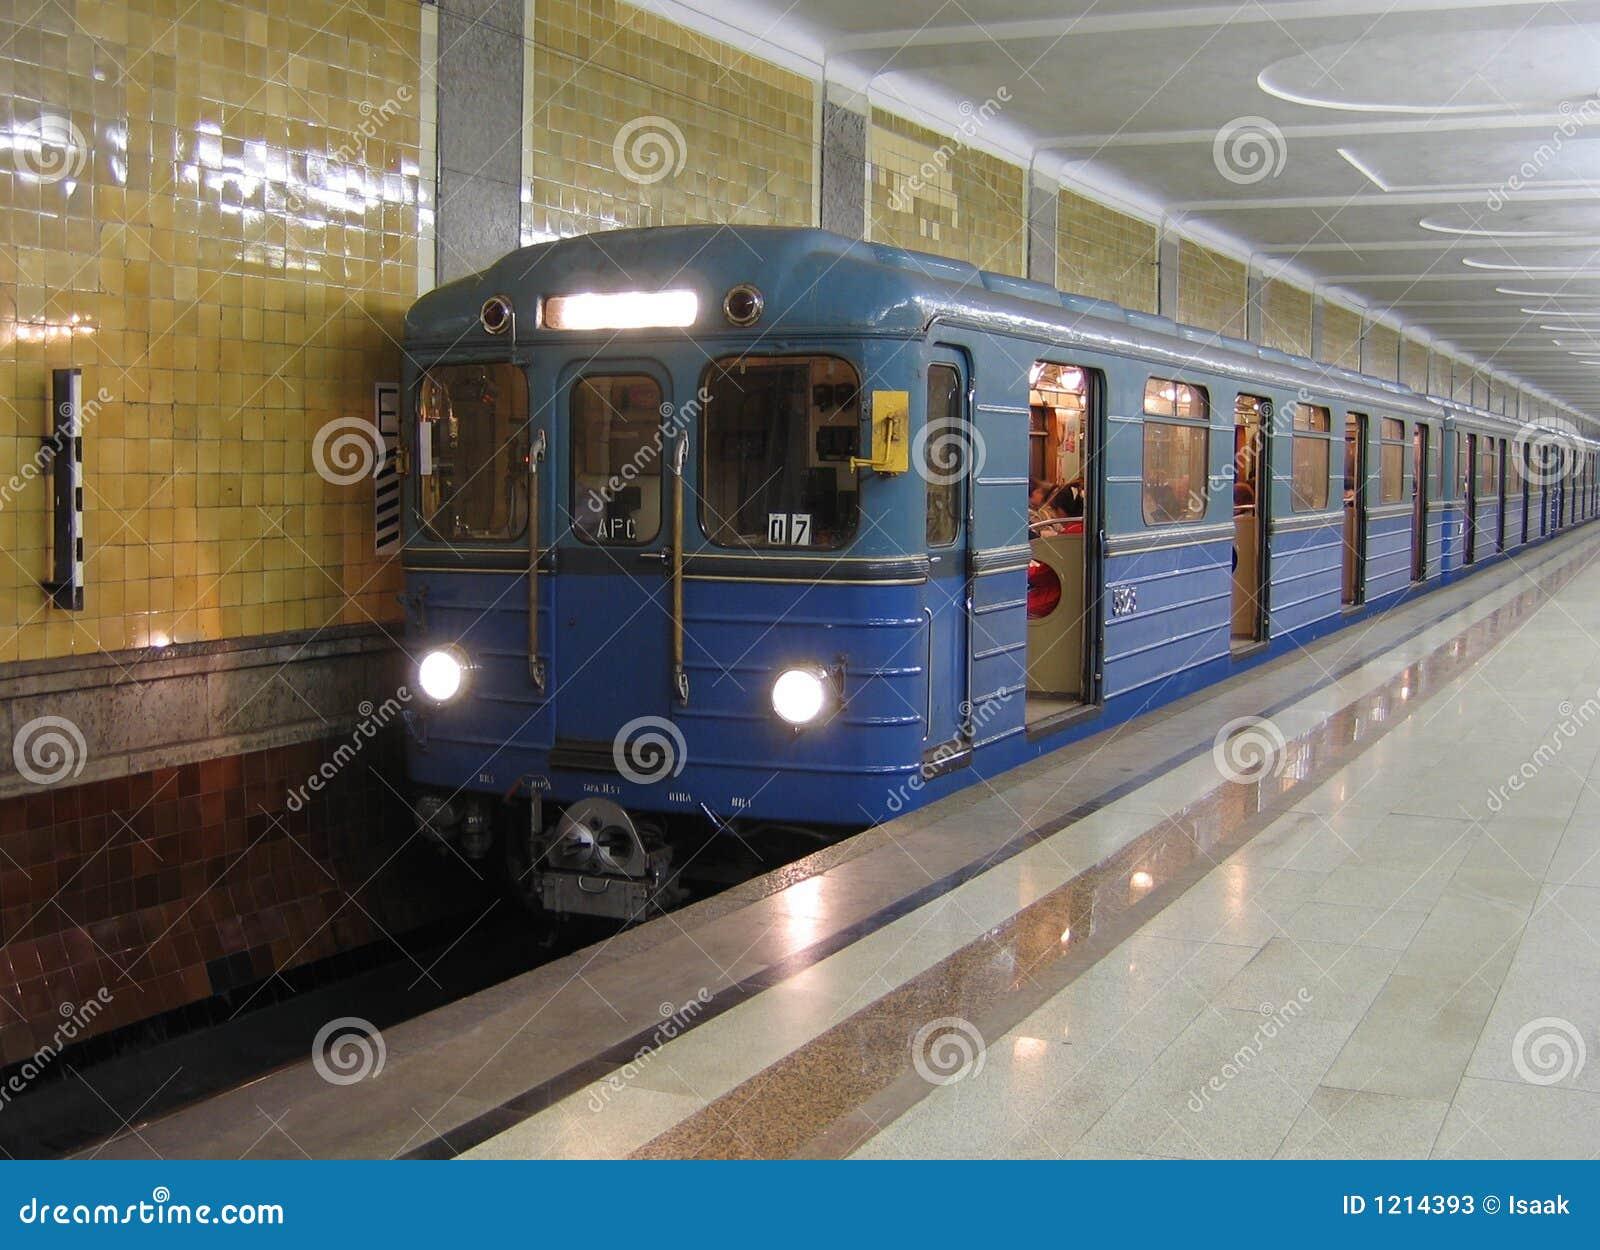 Untergrundbahn in Moskau